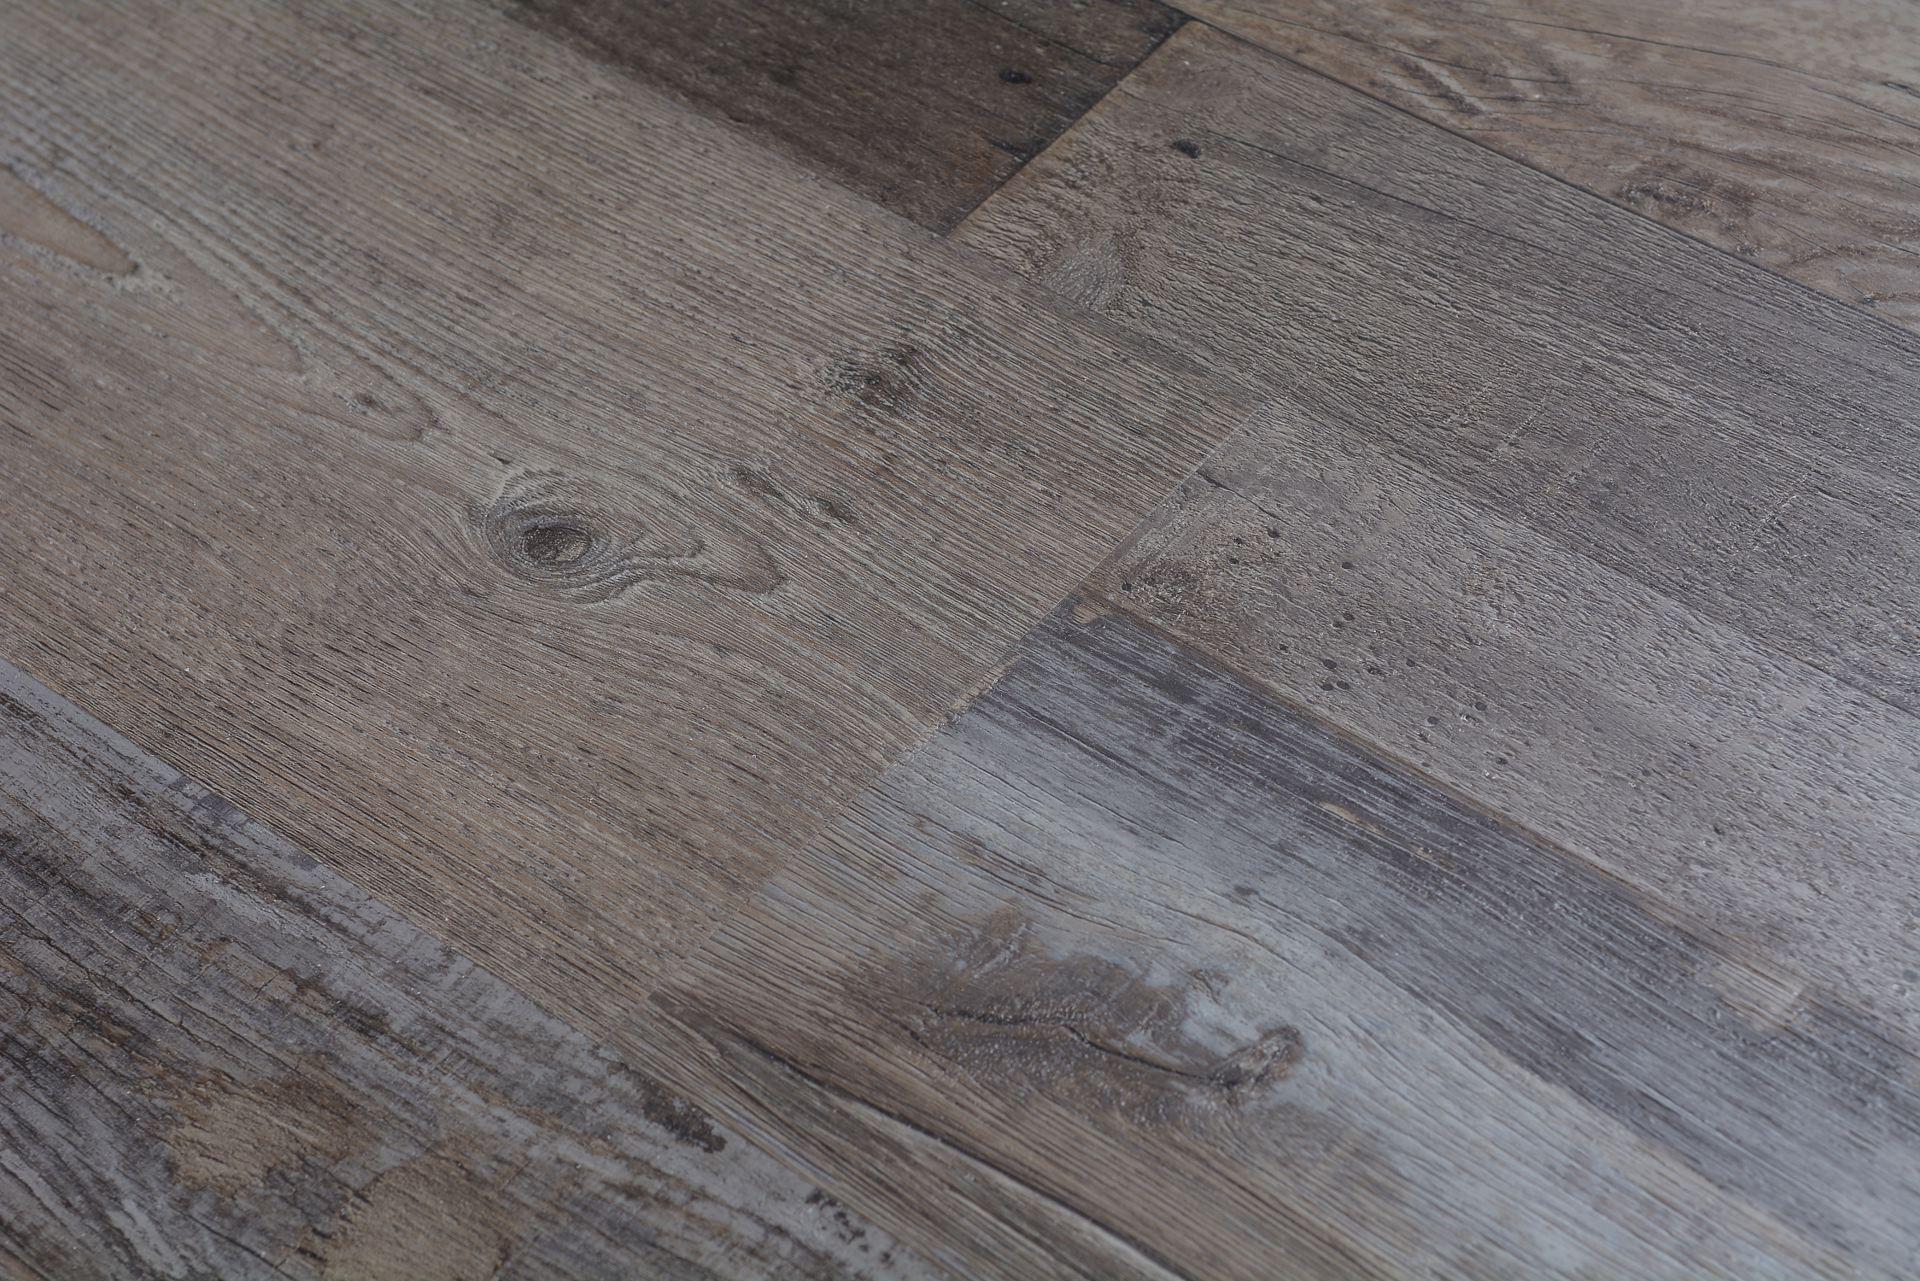 Engineered hardwood flooring laminate 2018 dodge reviews for Lp engineered wood